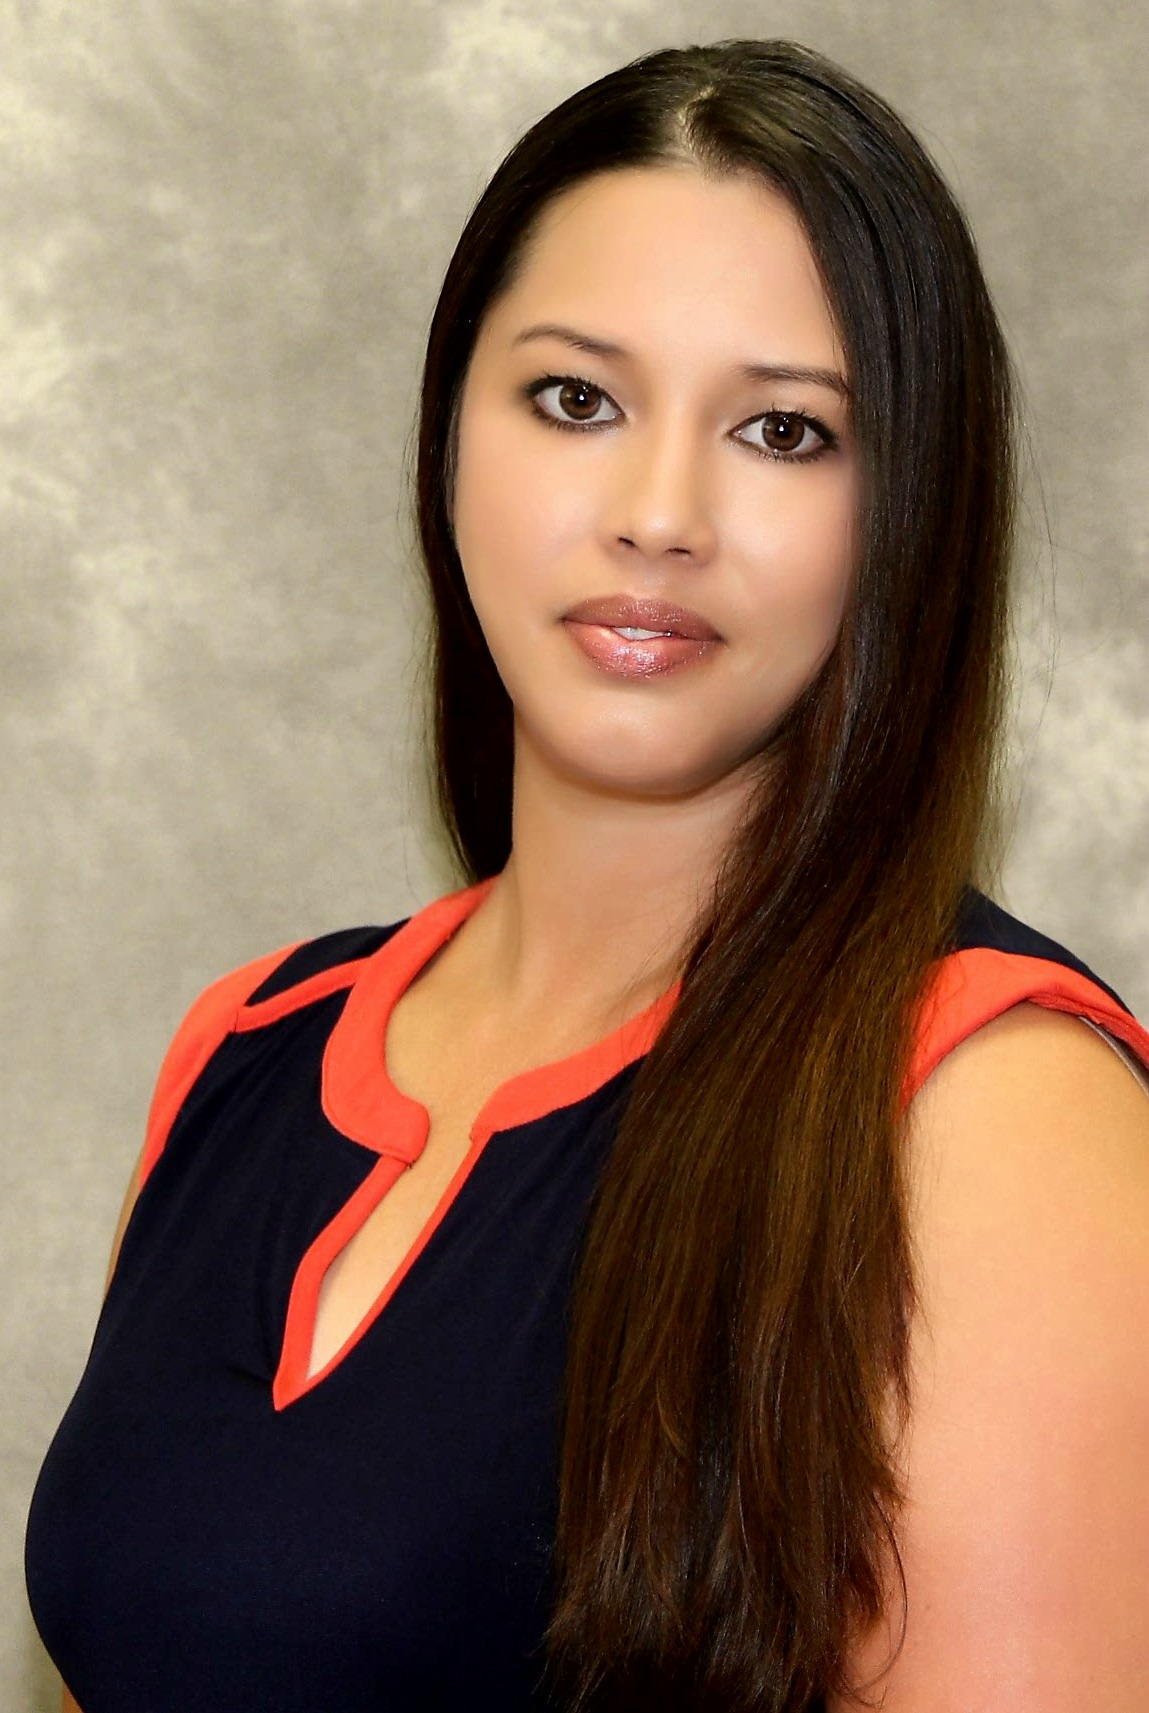 Allstate Motorcycle Insurance >> Allstate   Car Insurance in Houston, TX - Vanessa Garcia